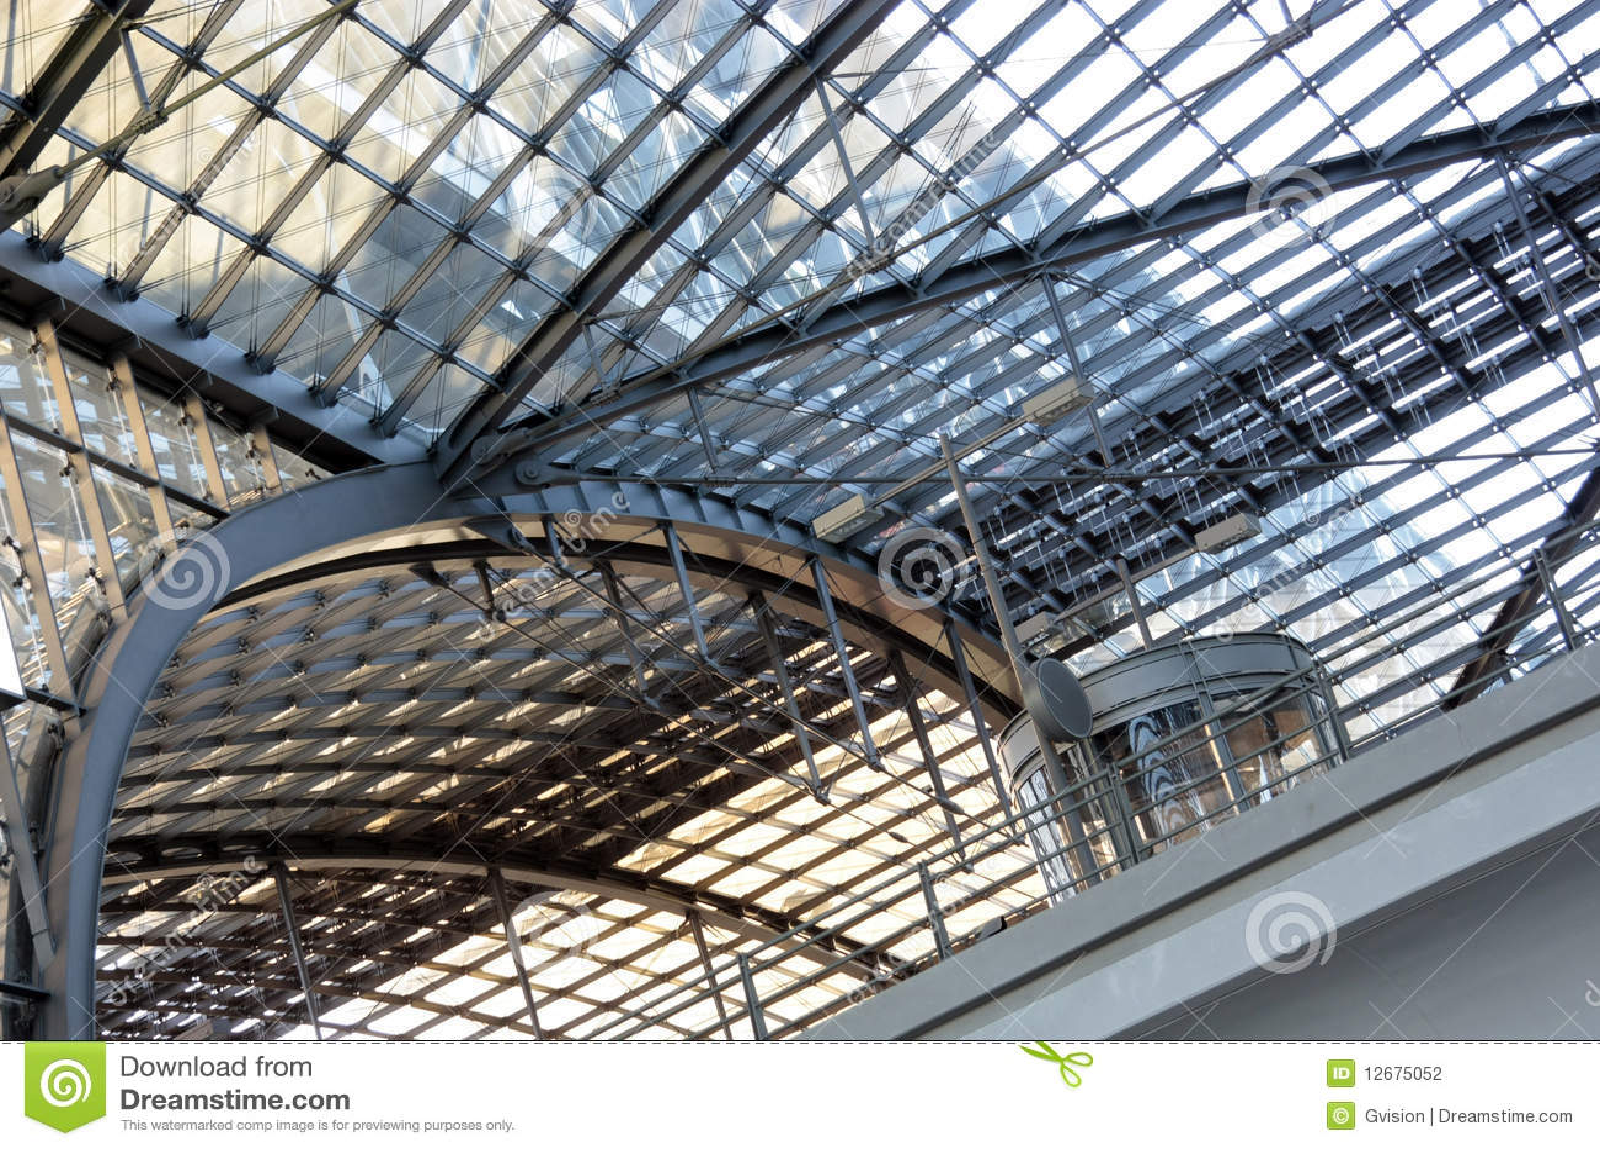 All About Glass 14-2: Stretch glass-Fostoria-New Martinsville Muranese-Guttate